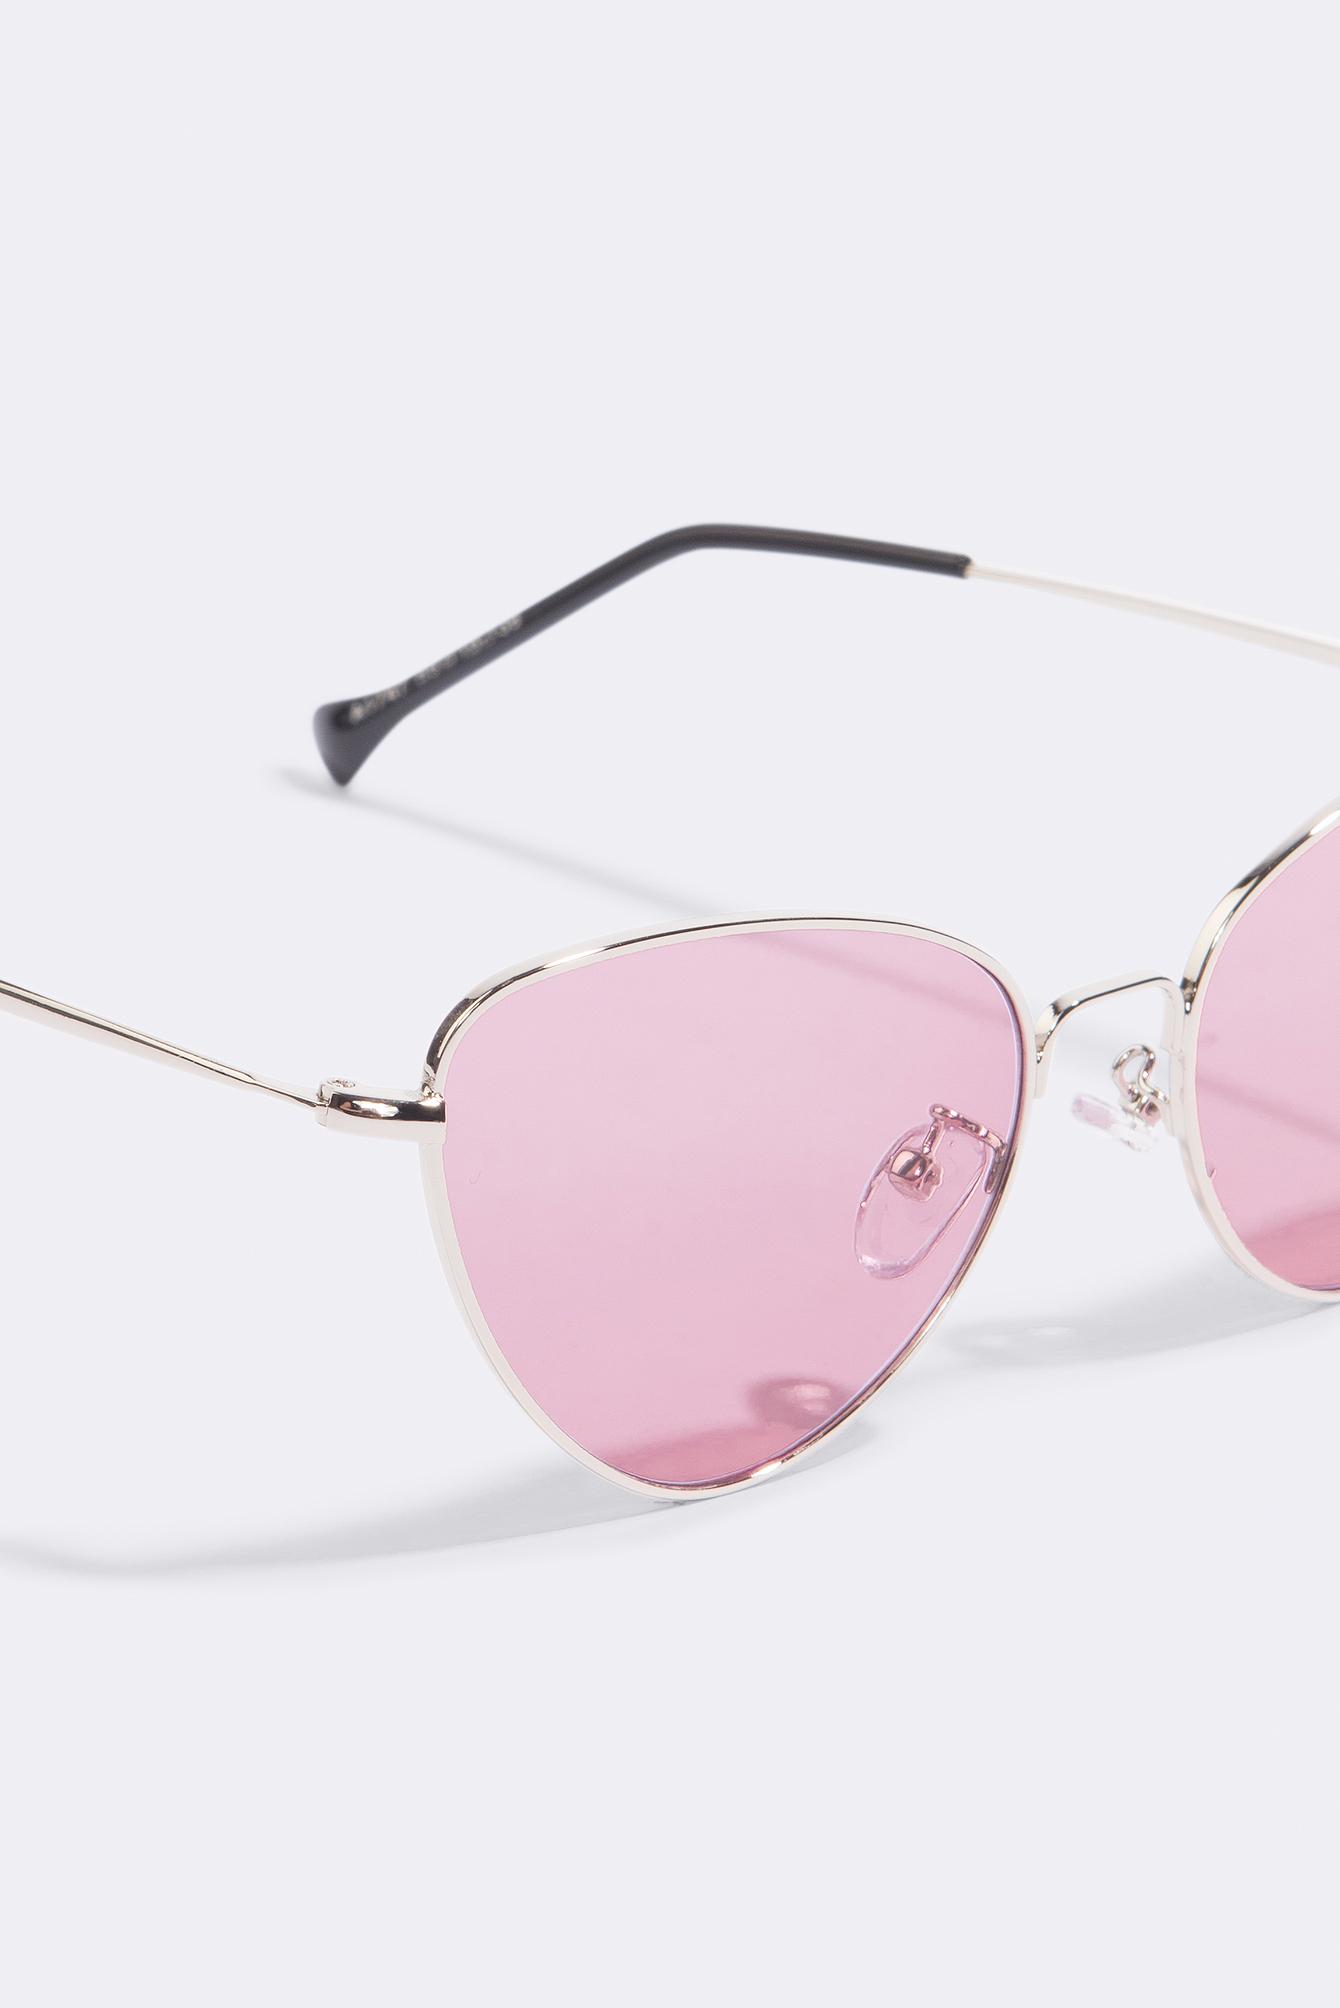 NA-KD Accessories Metal Frame Cat Eye Sunglasses - Pink rLijP